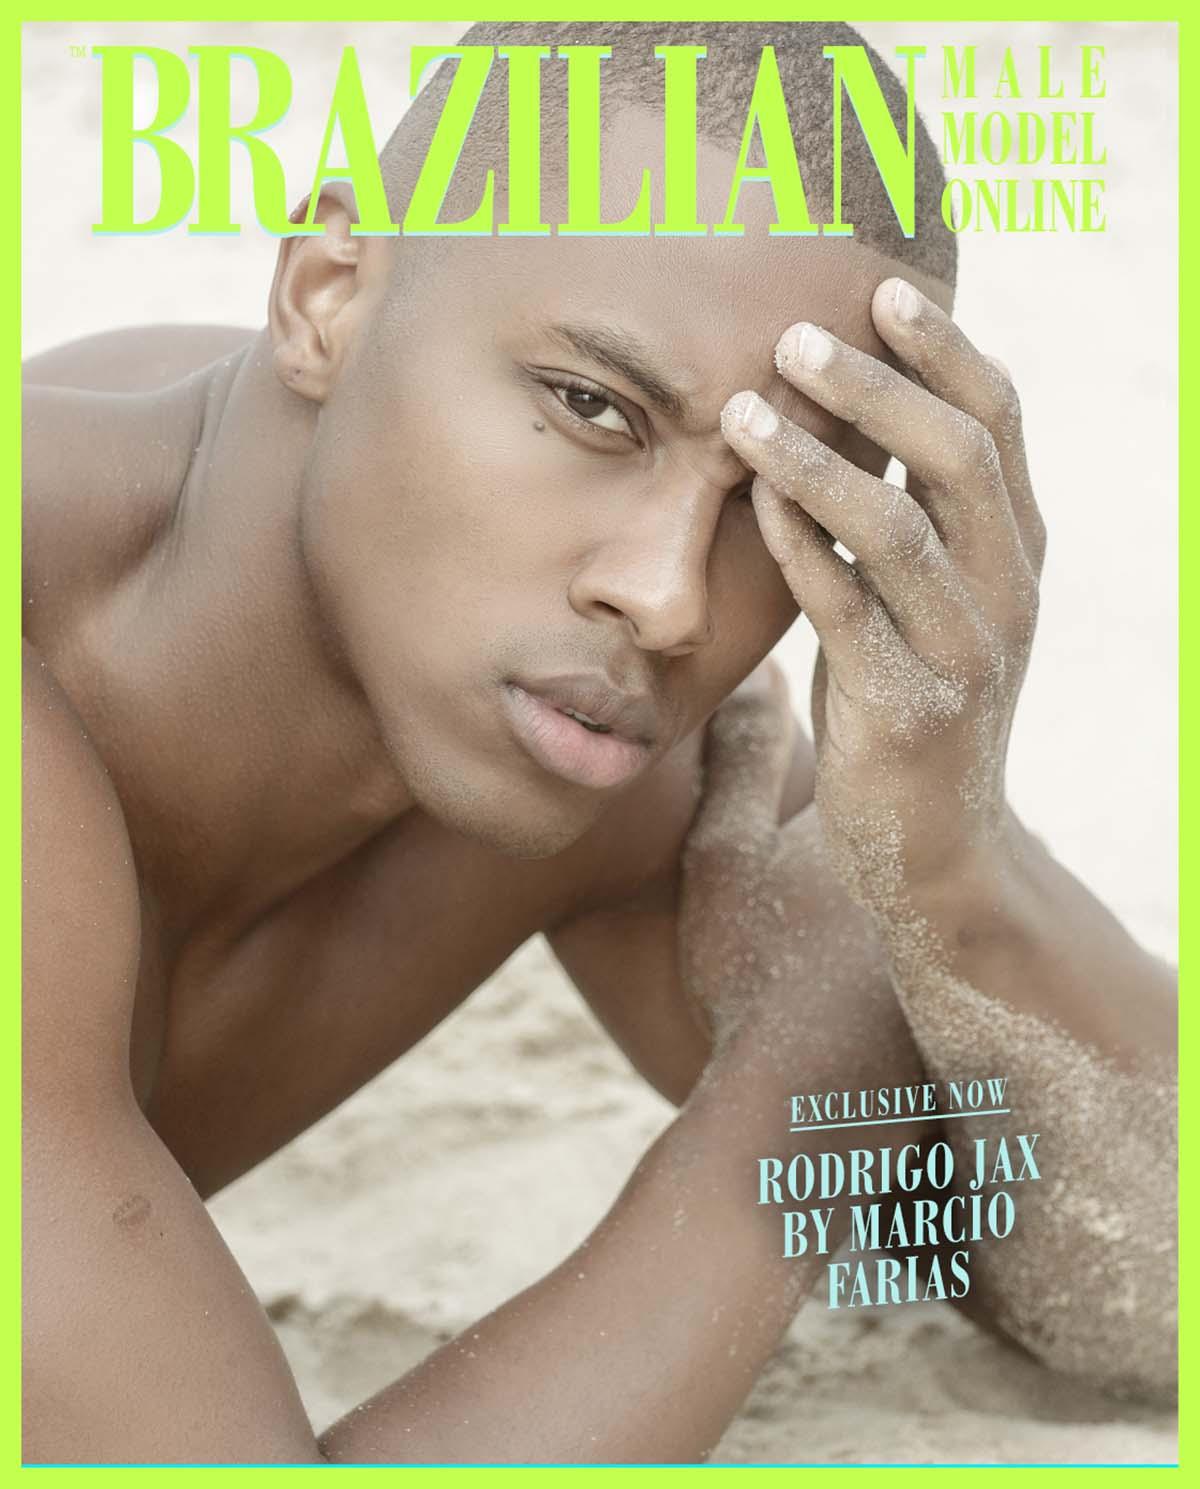 Rodrigo Jax X Marcio Farias X Brazilian Male Model X YUP MAGAZINE